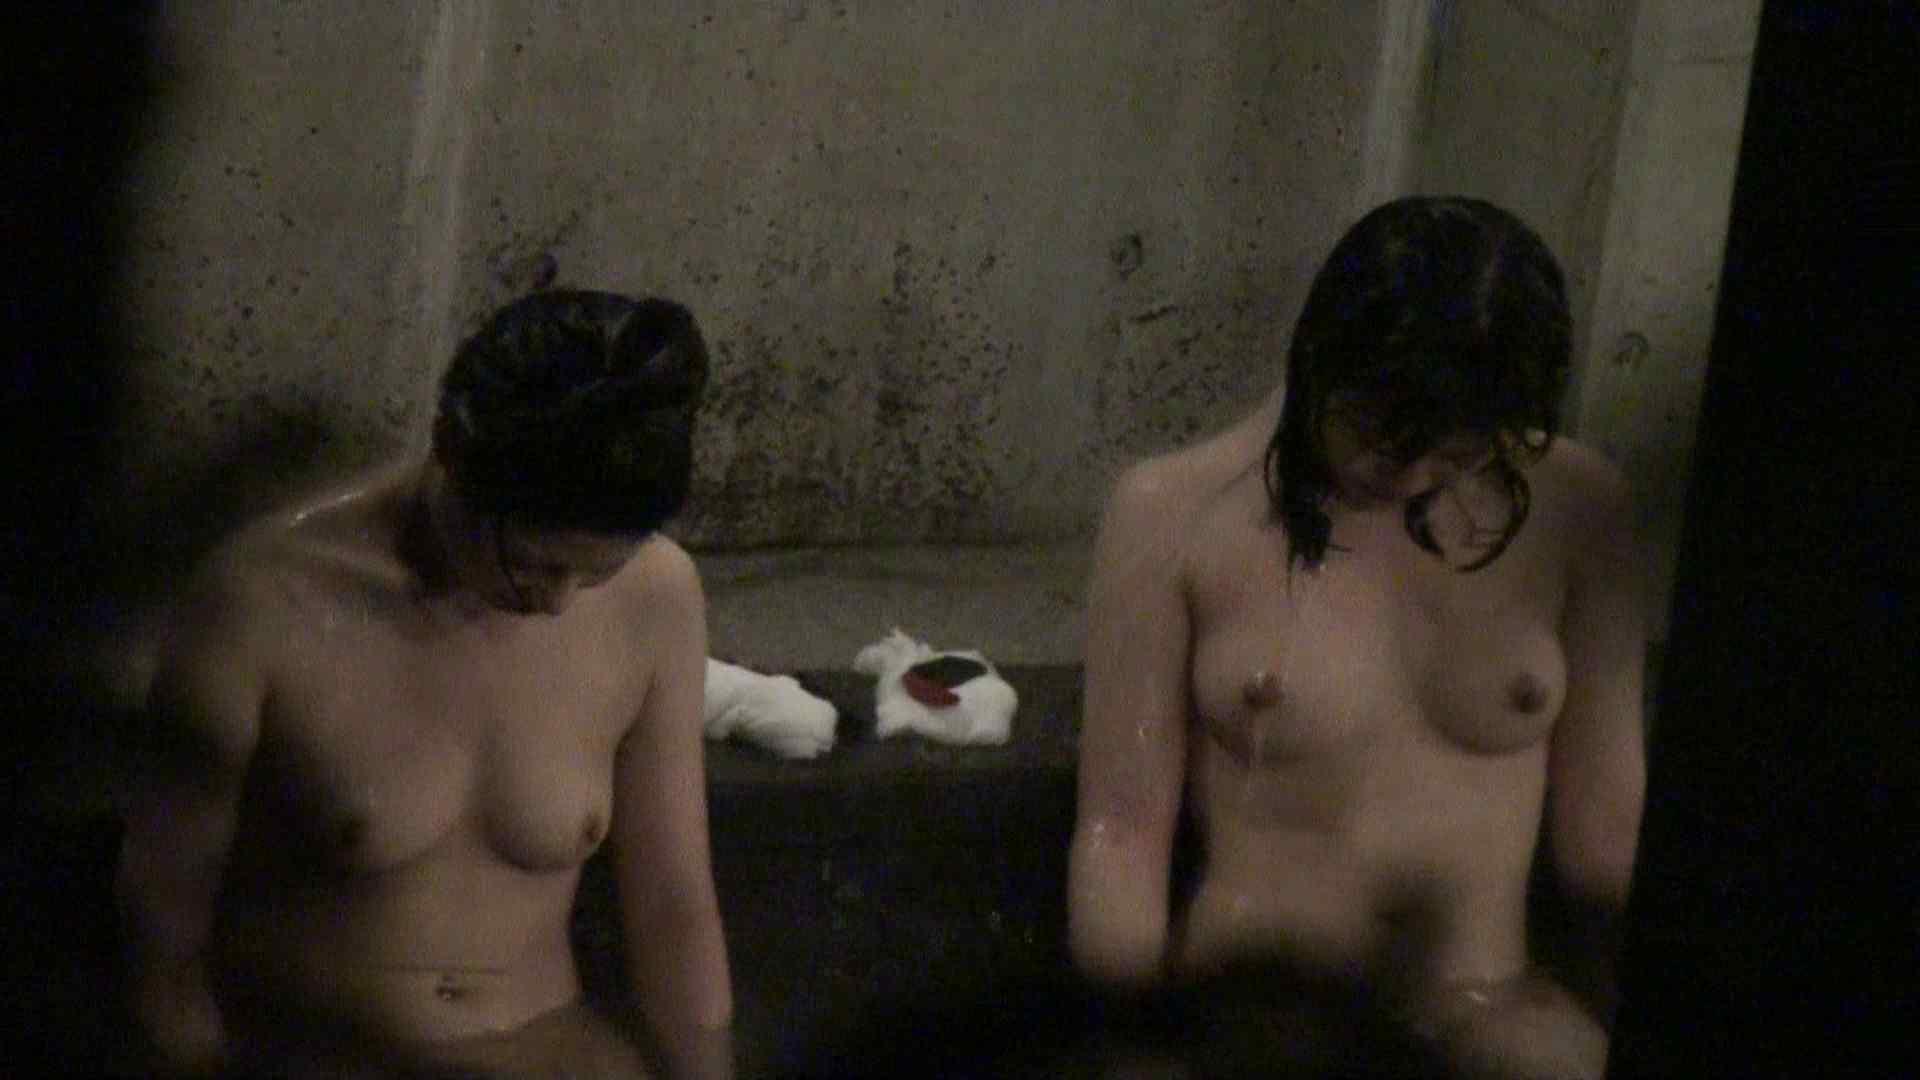 Aquaな露天風呂Vol.350 OLのプライベート  11pic 9